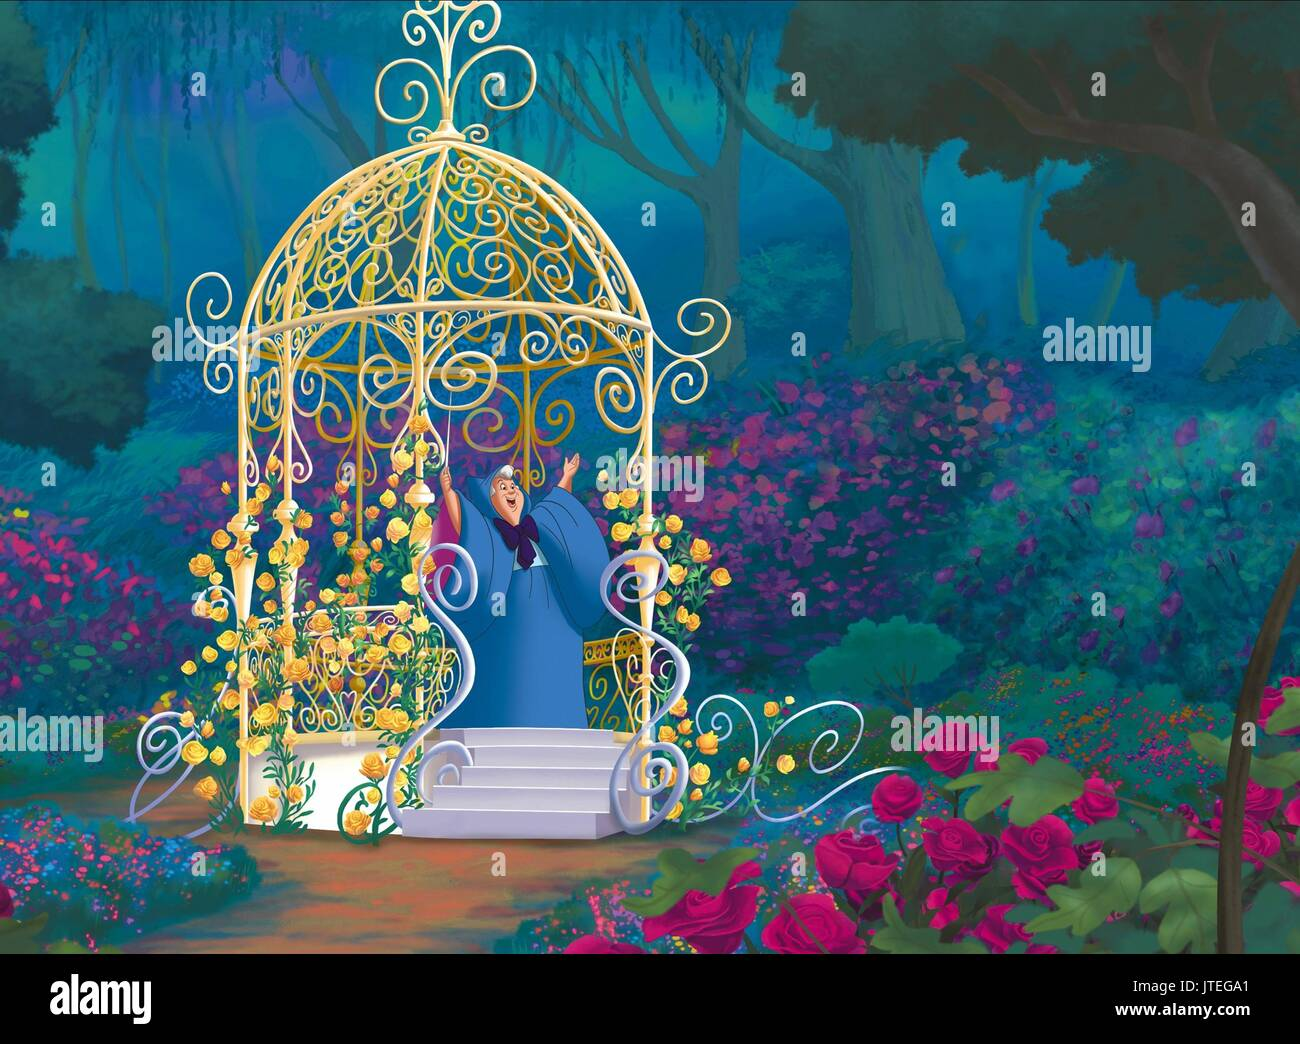 Elf Or A Fairy Stock Photos & Elf Or A Fairy Stock Images - Alamy